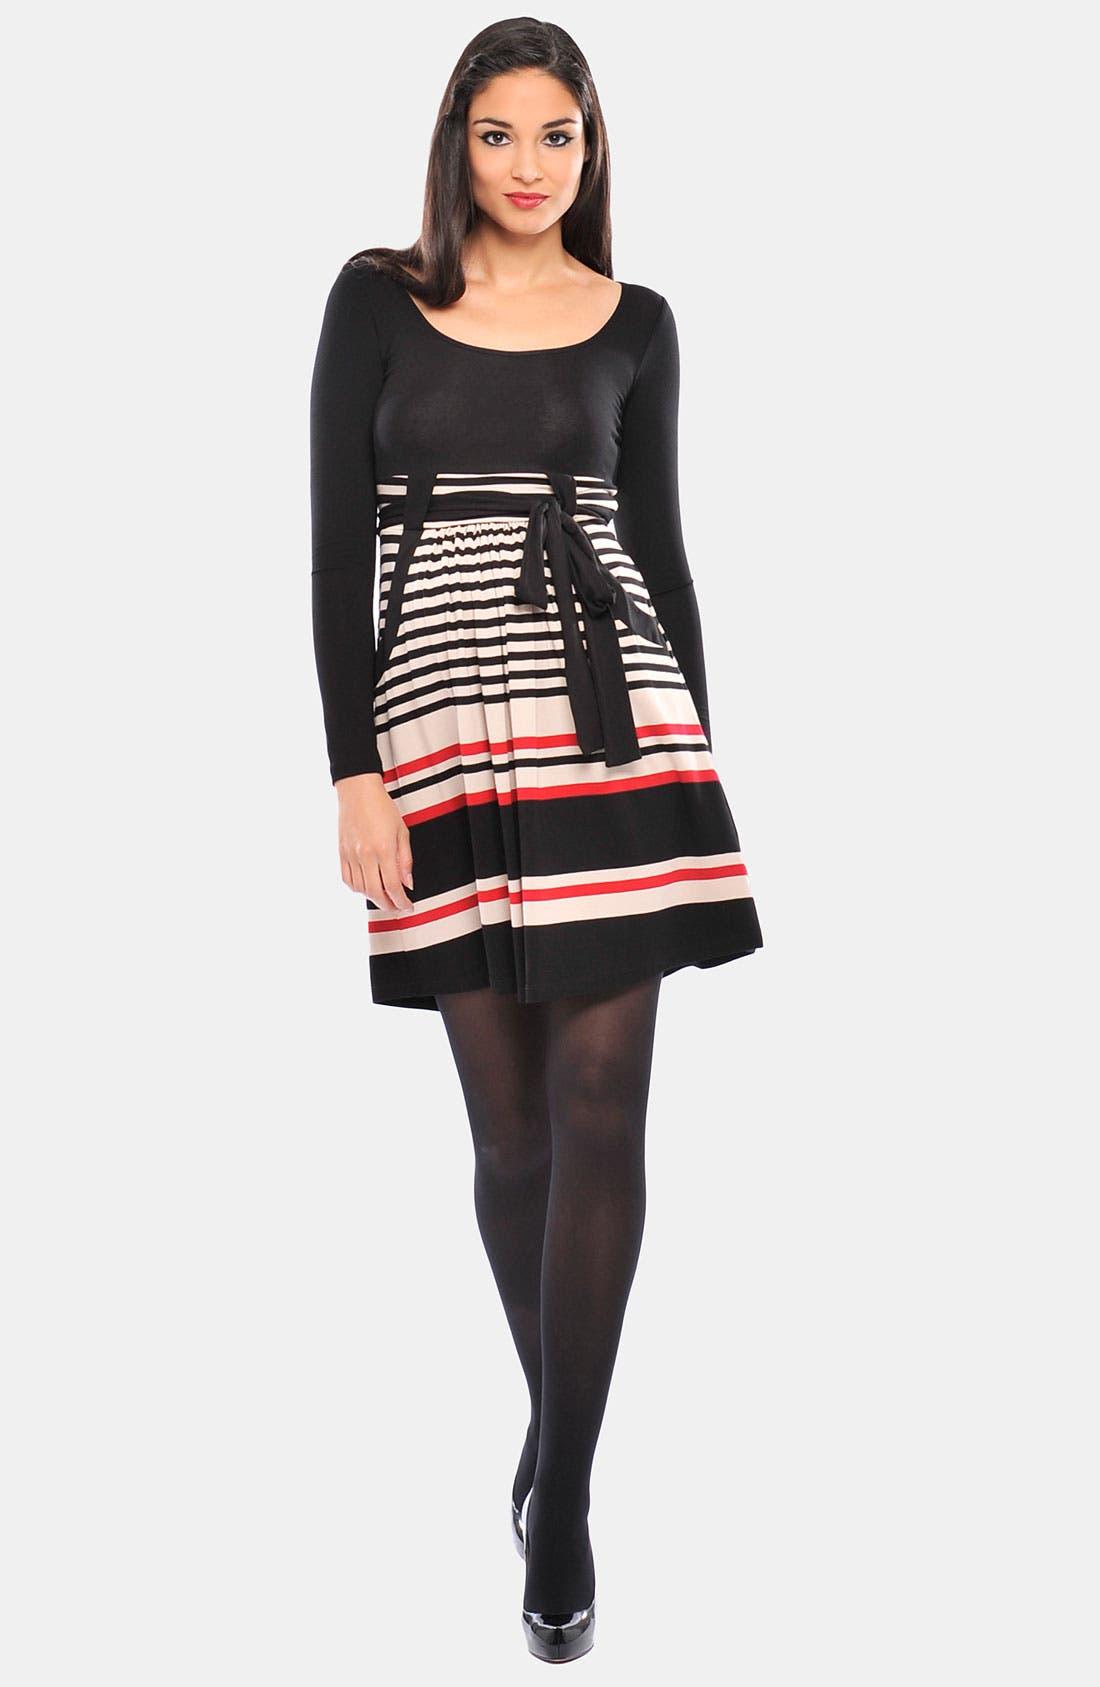 Alternate Image 1 Selected - Olian 'Kayla' Stripe Cross Front Maternity Tunic